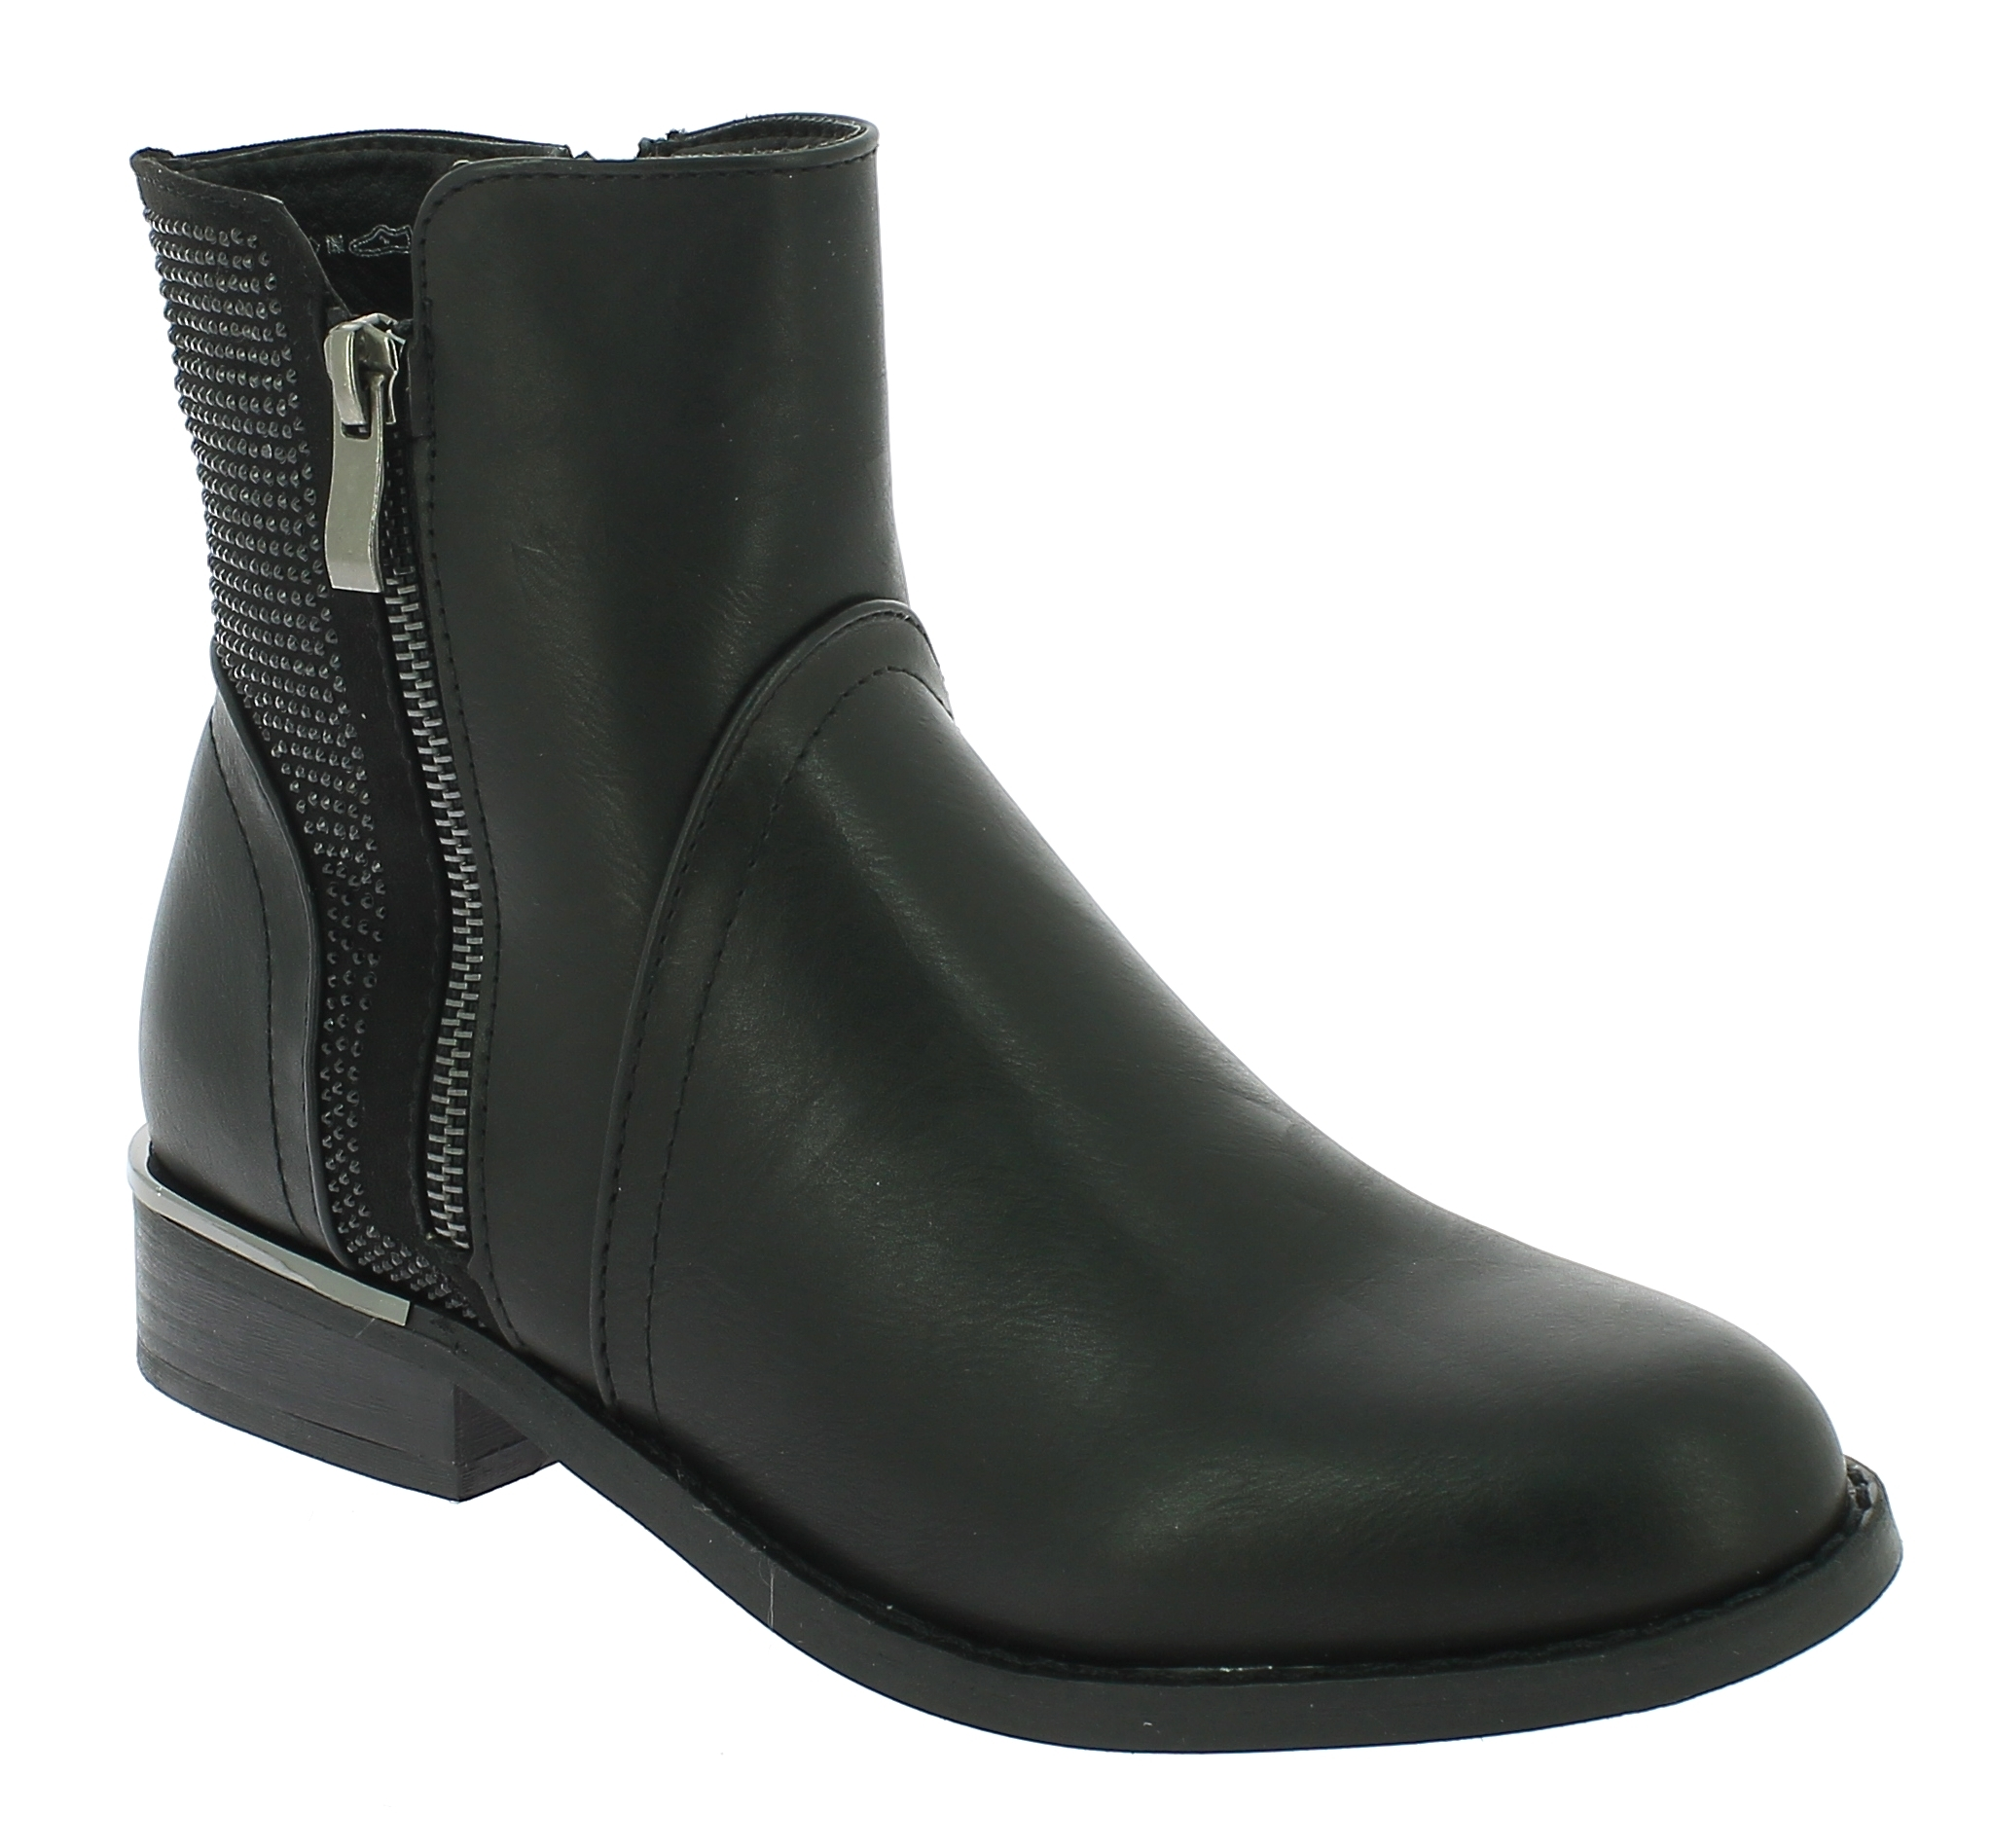 IQSHOES Γυναικείο Μποτάκι 2269379 Μαύρο - IqShoes - 2.269379 BLACK-black-37/1/15 παπούτσια  new in